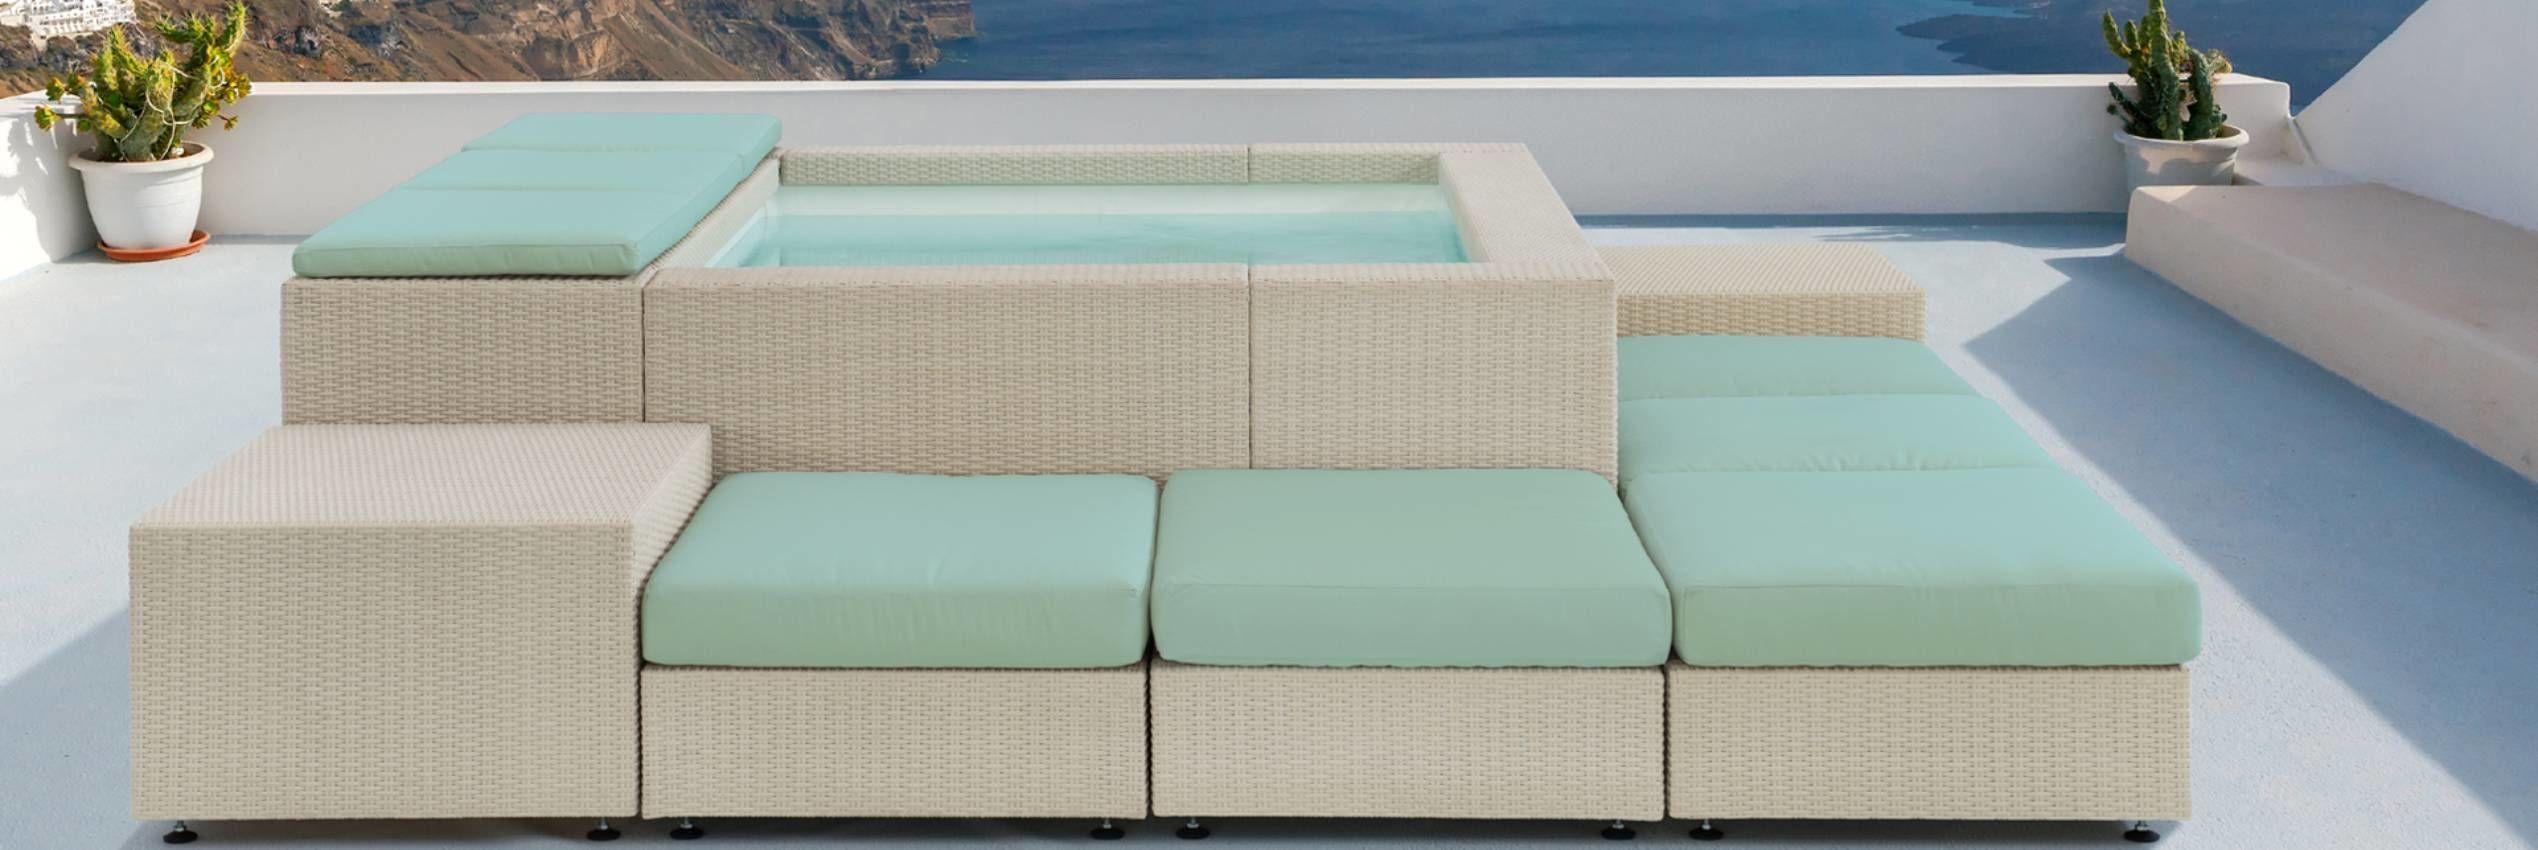 Terasový bazének Laghetto Playa